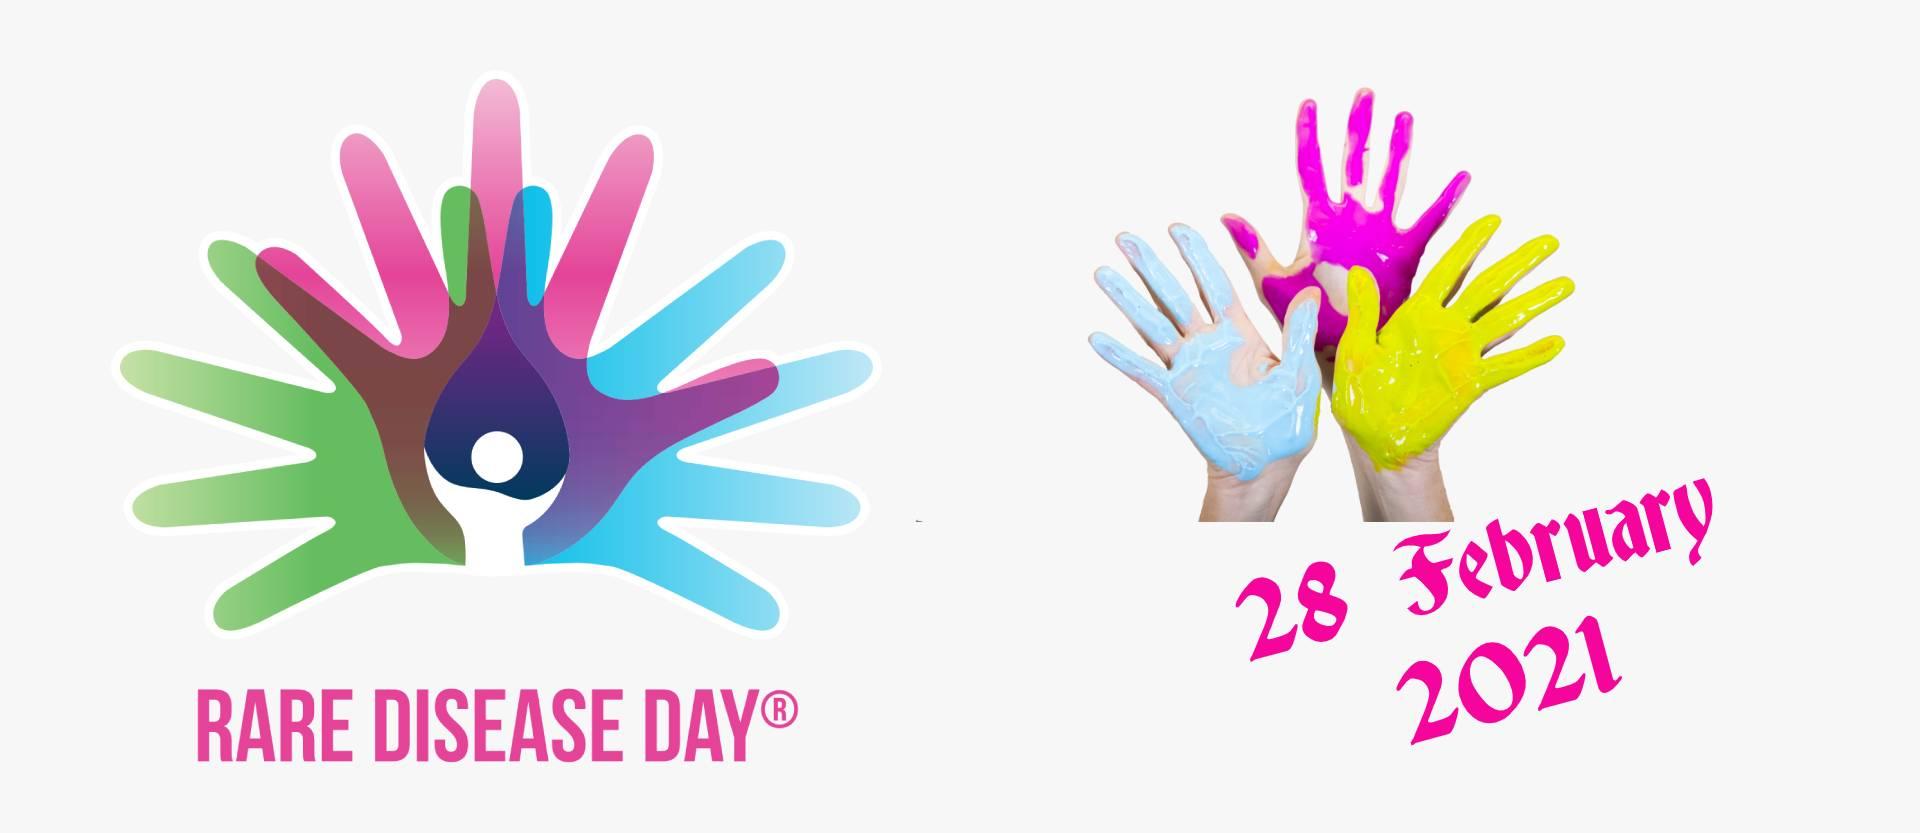 Rare Disease Day 28 February 2021 - Rare Diseases India ...